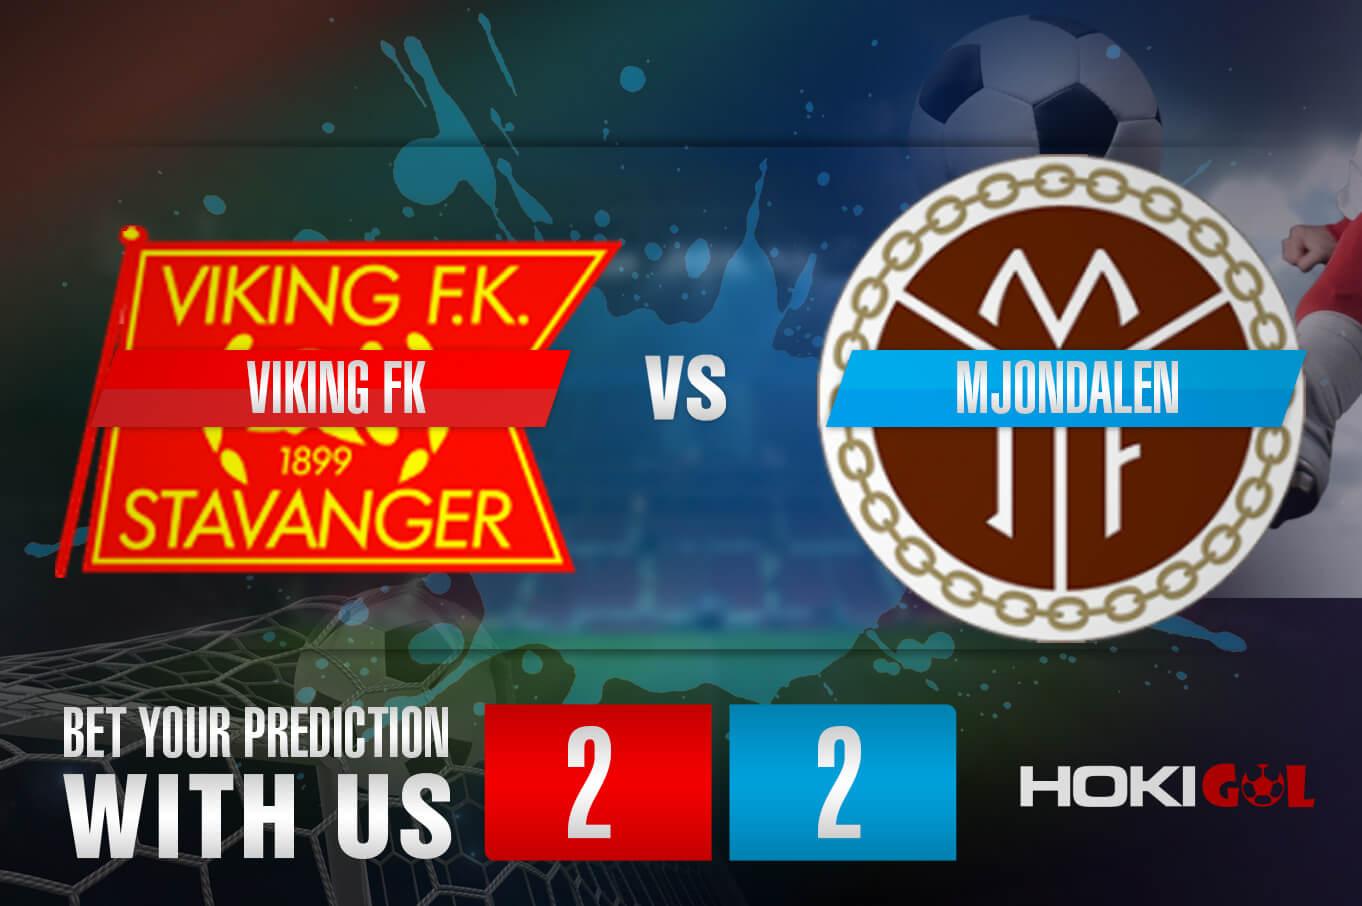 Prediksi Bola Viking FK Vs Mjondalen IF Fotball 27 Mei 2021